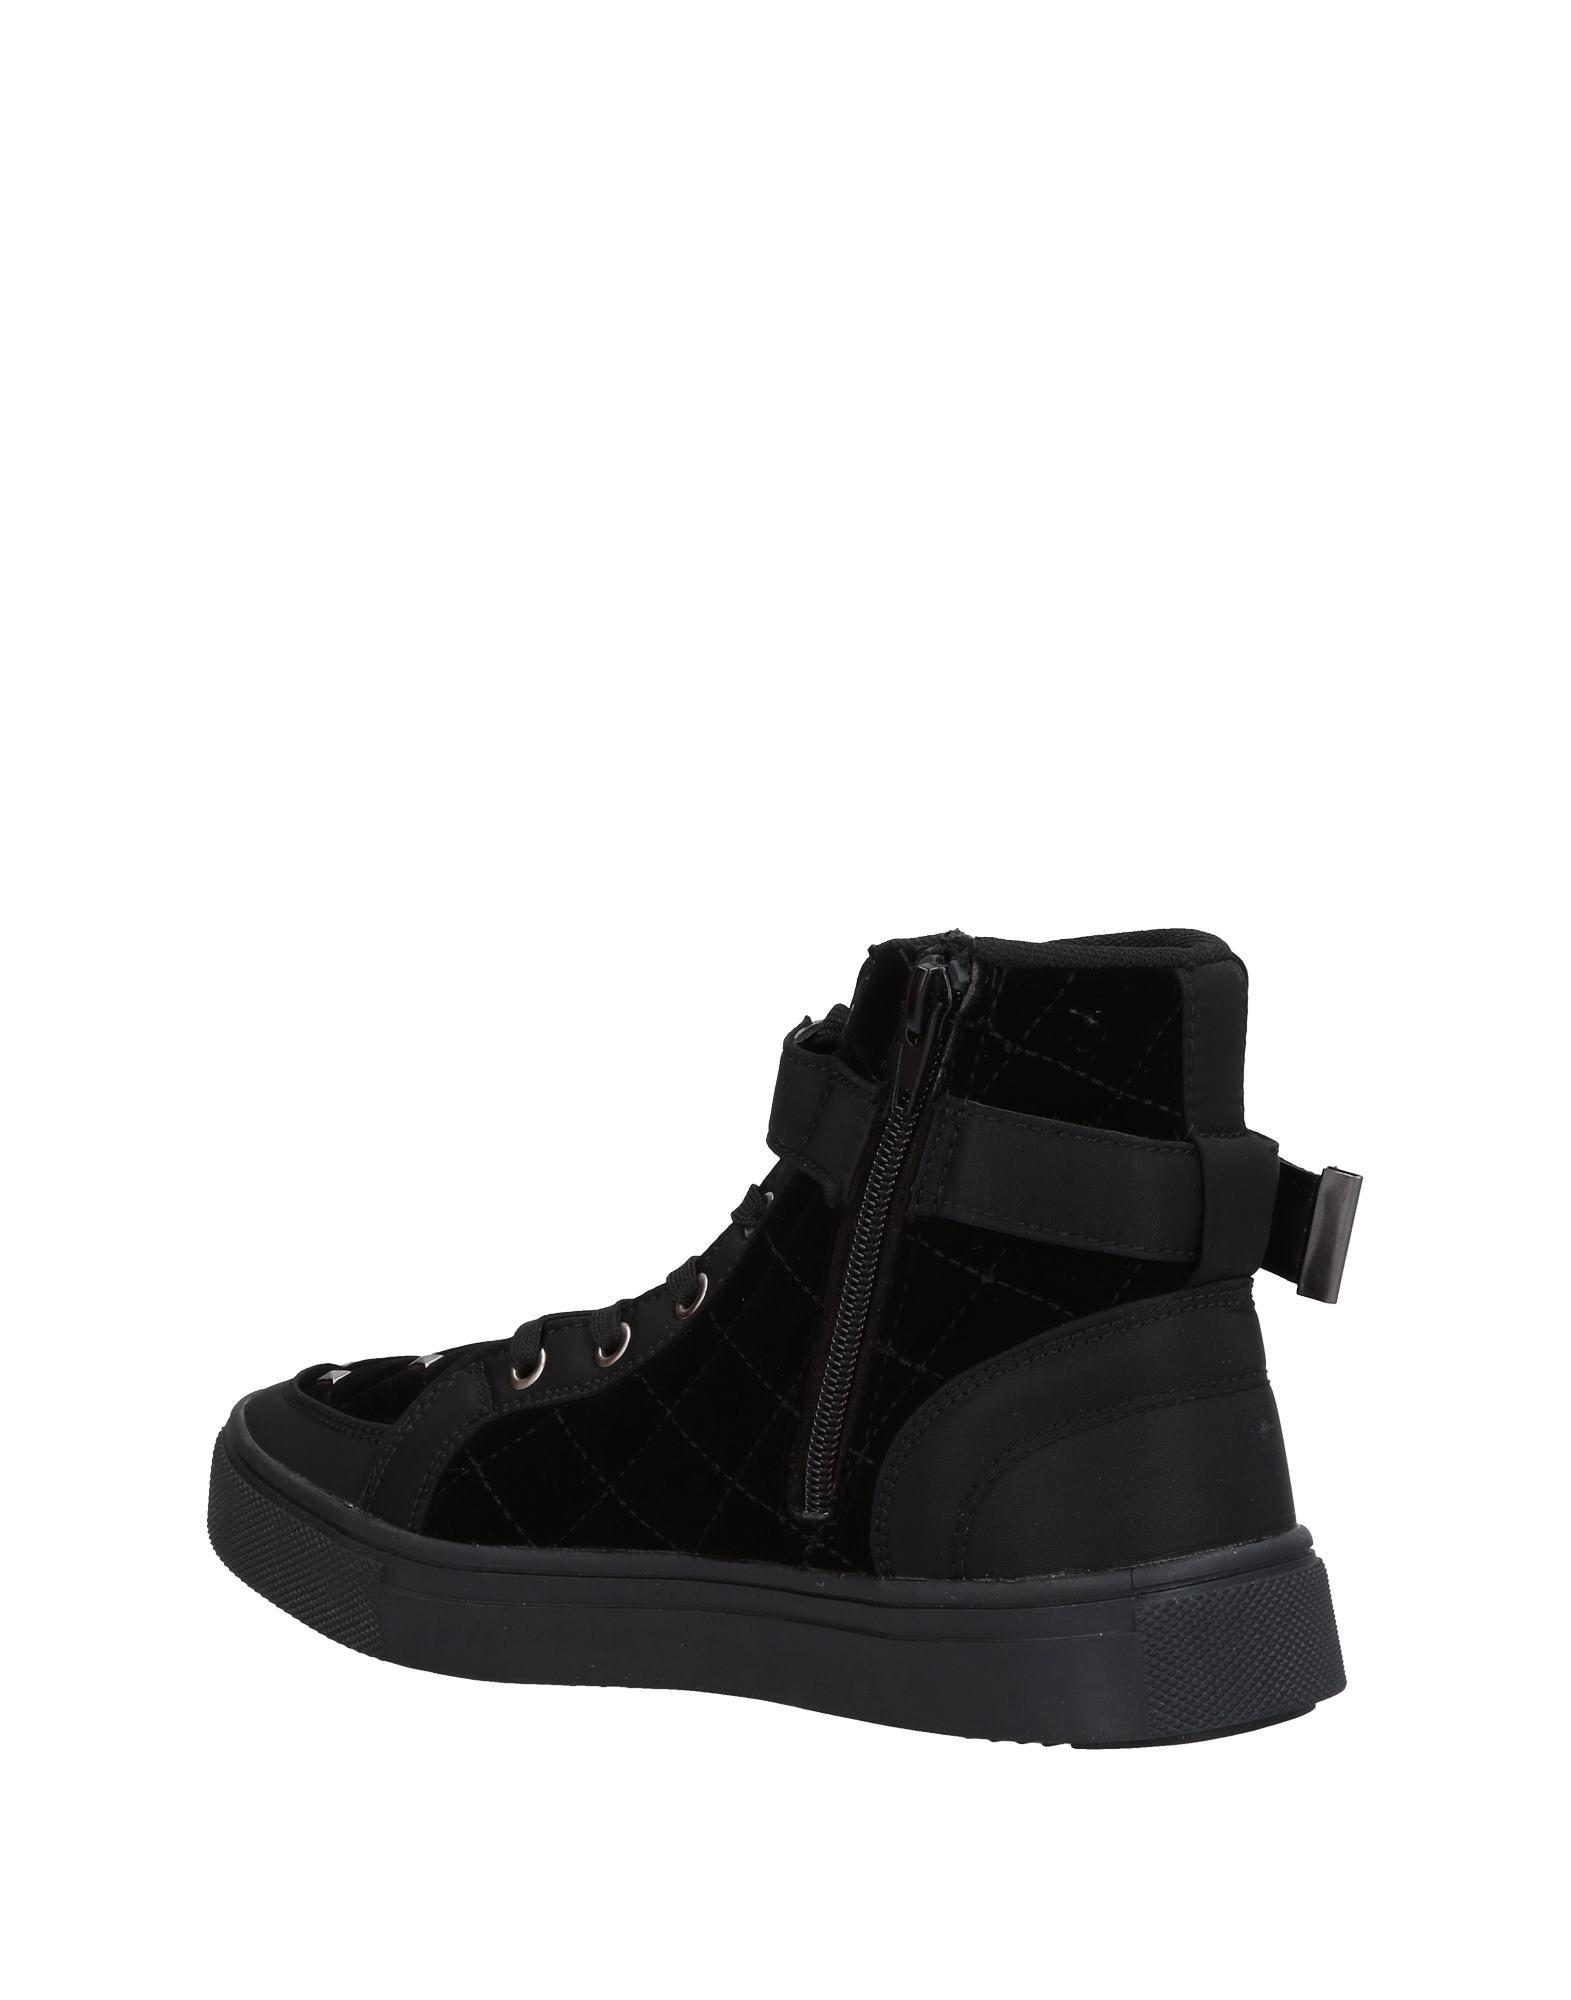 Sneakers Tua By Braccialini Femme - Sneakers Tua By Braccialini sur